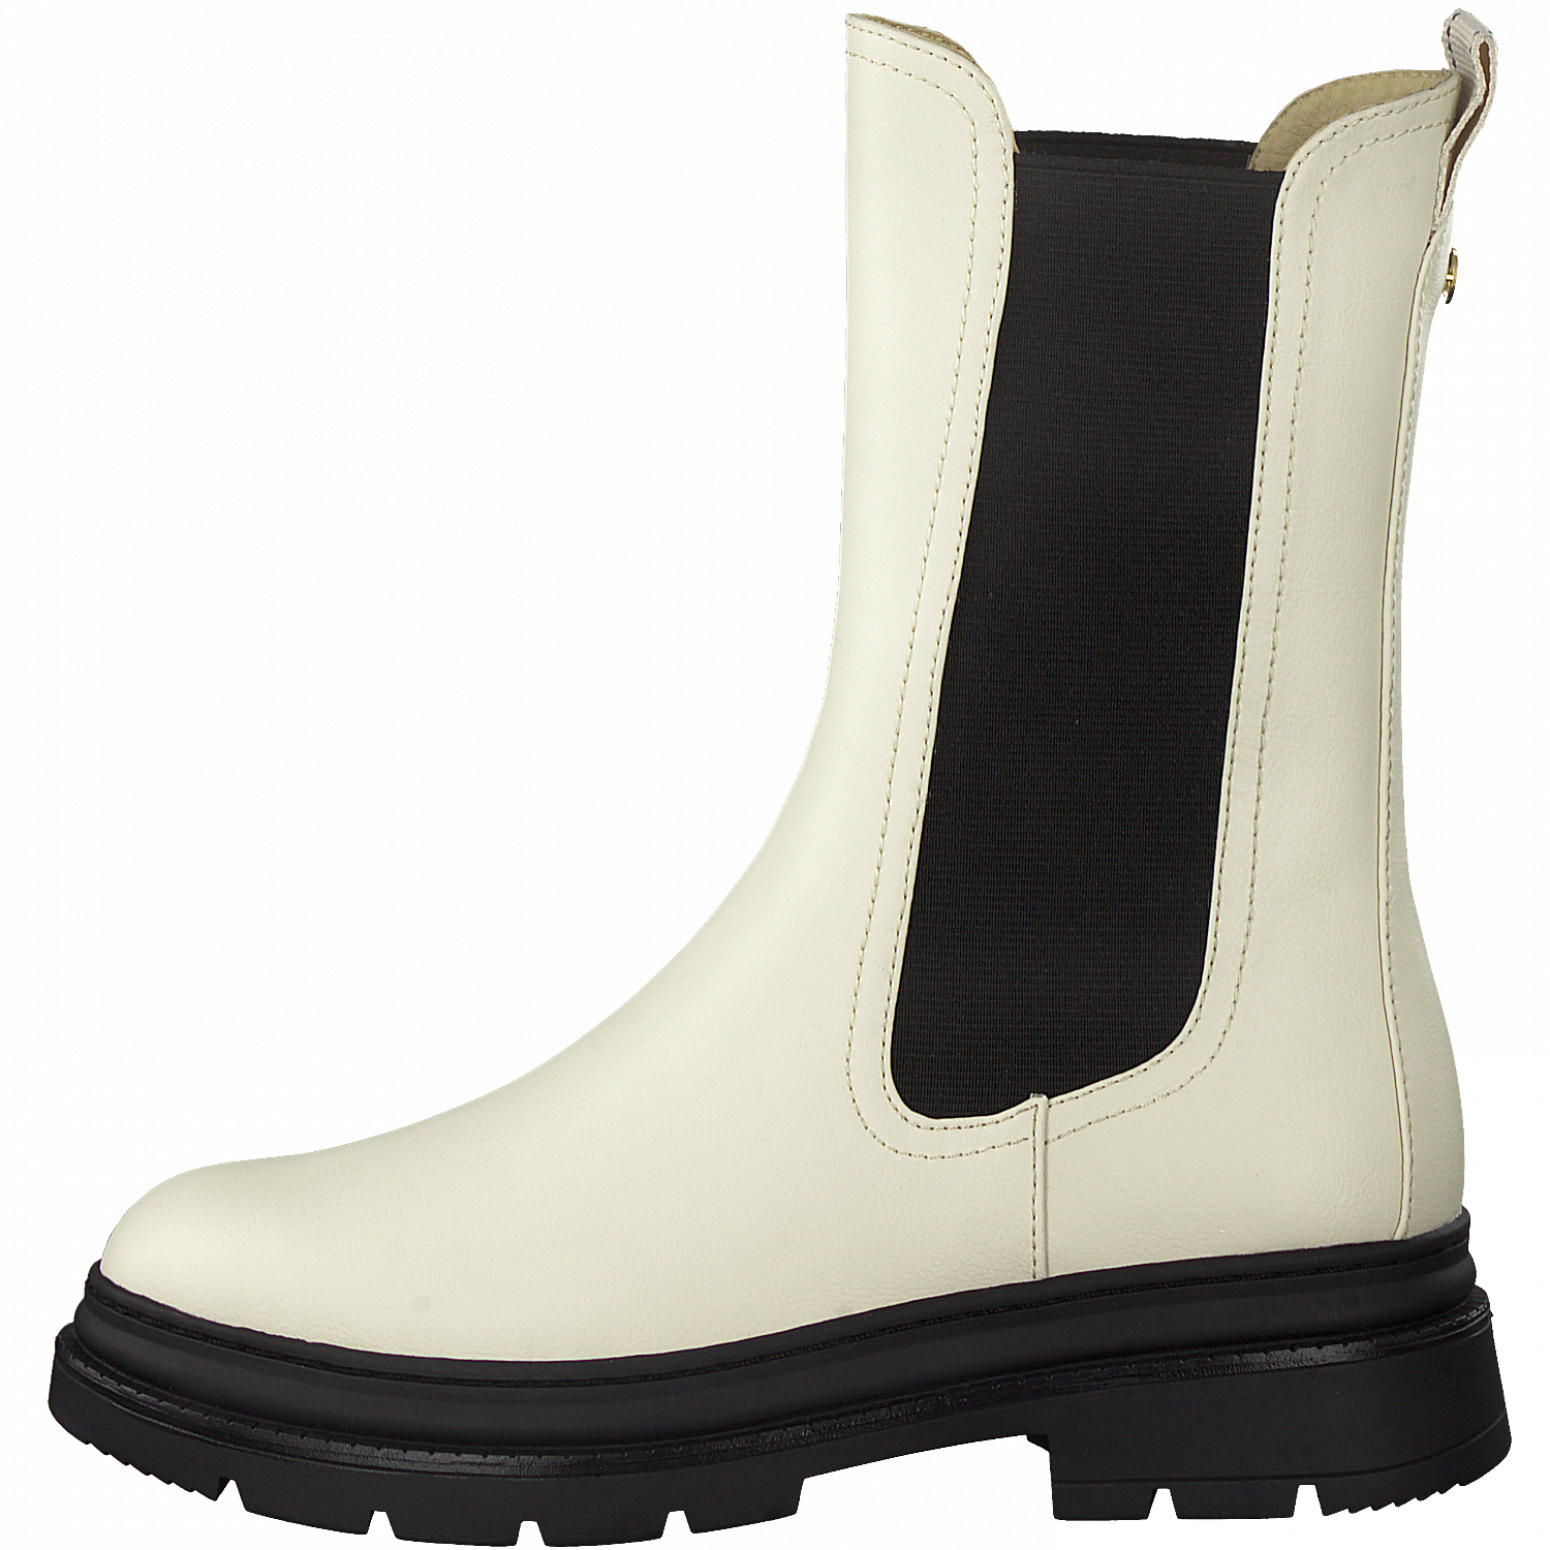 Tamaris 25452 støvle, ivory/black, 39